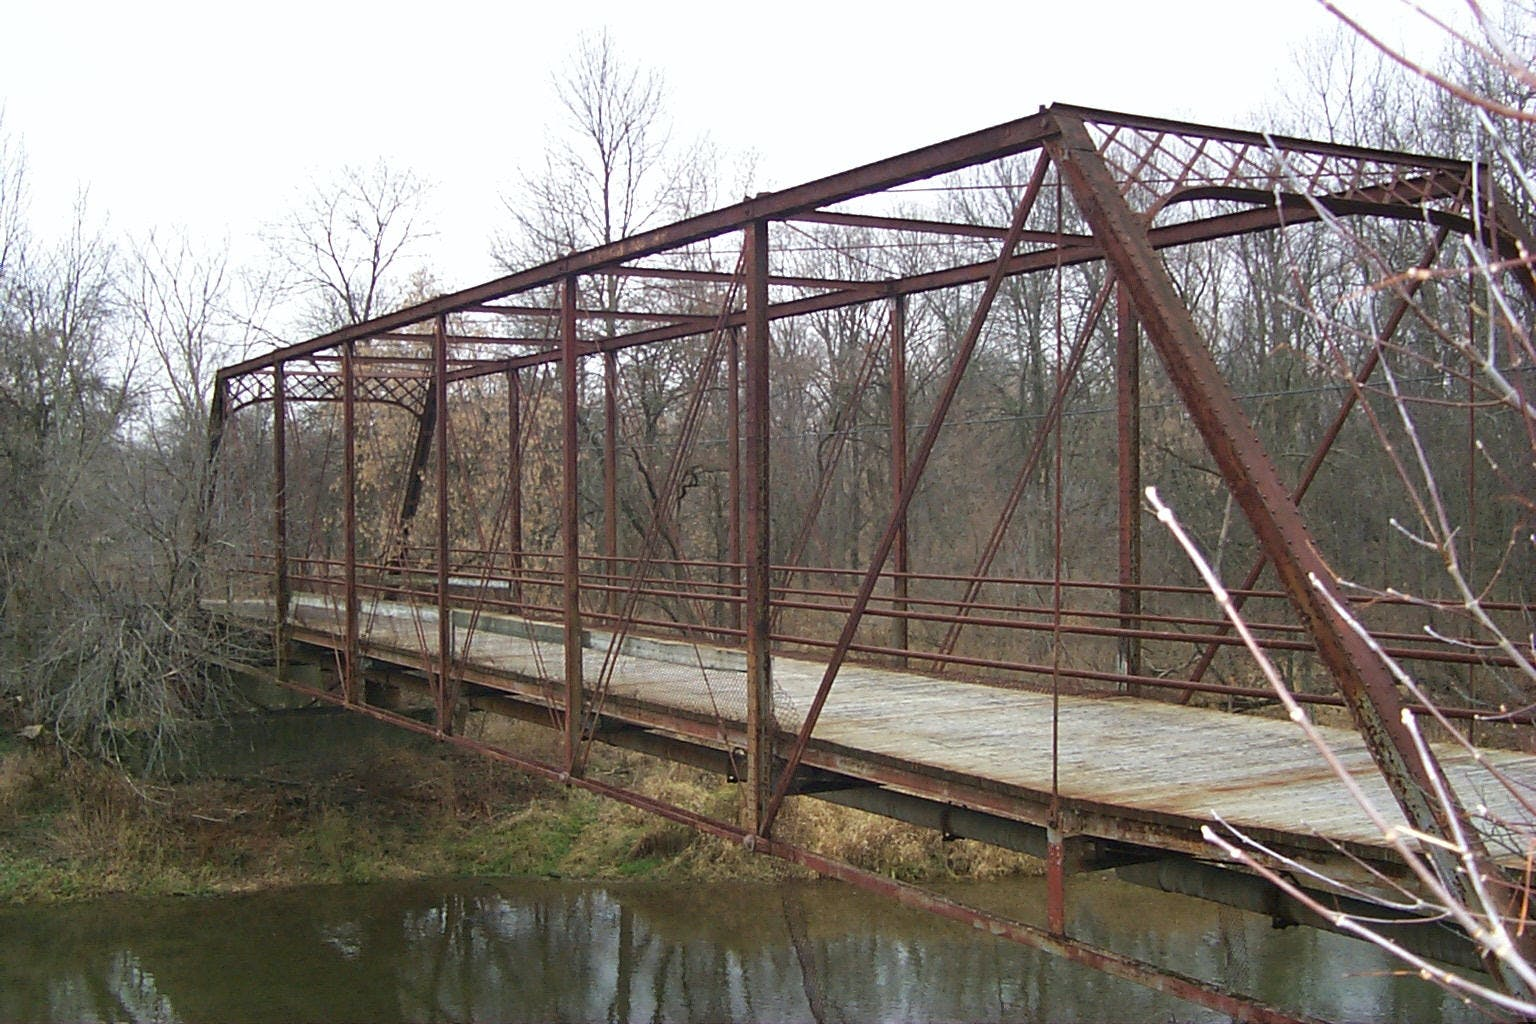 Nithvale Road Steel Truss Bridge